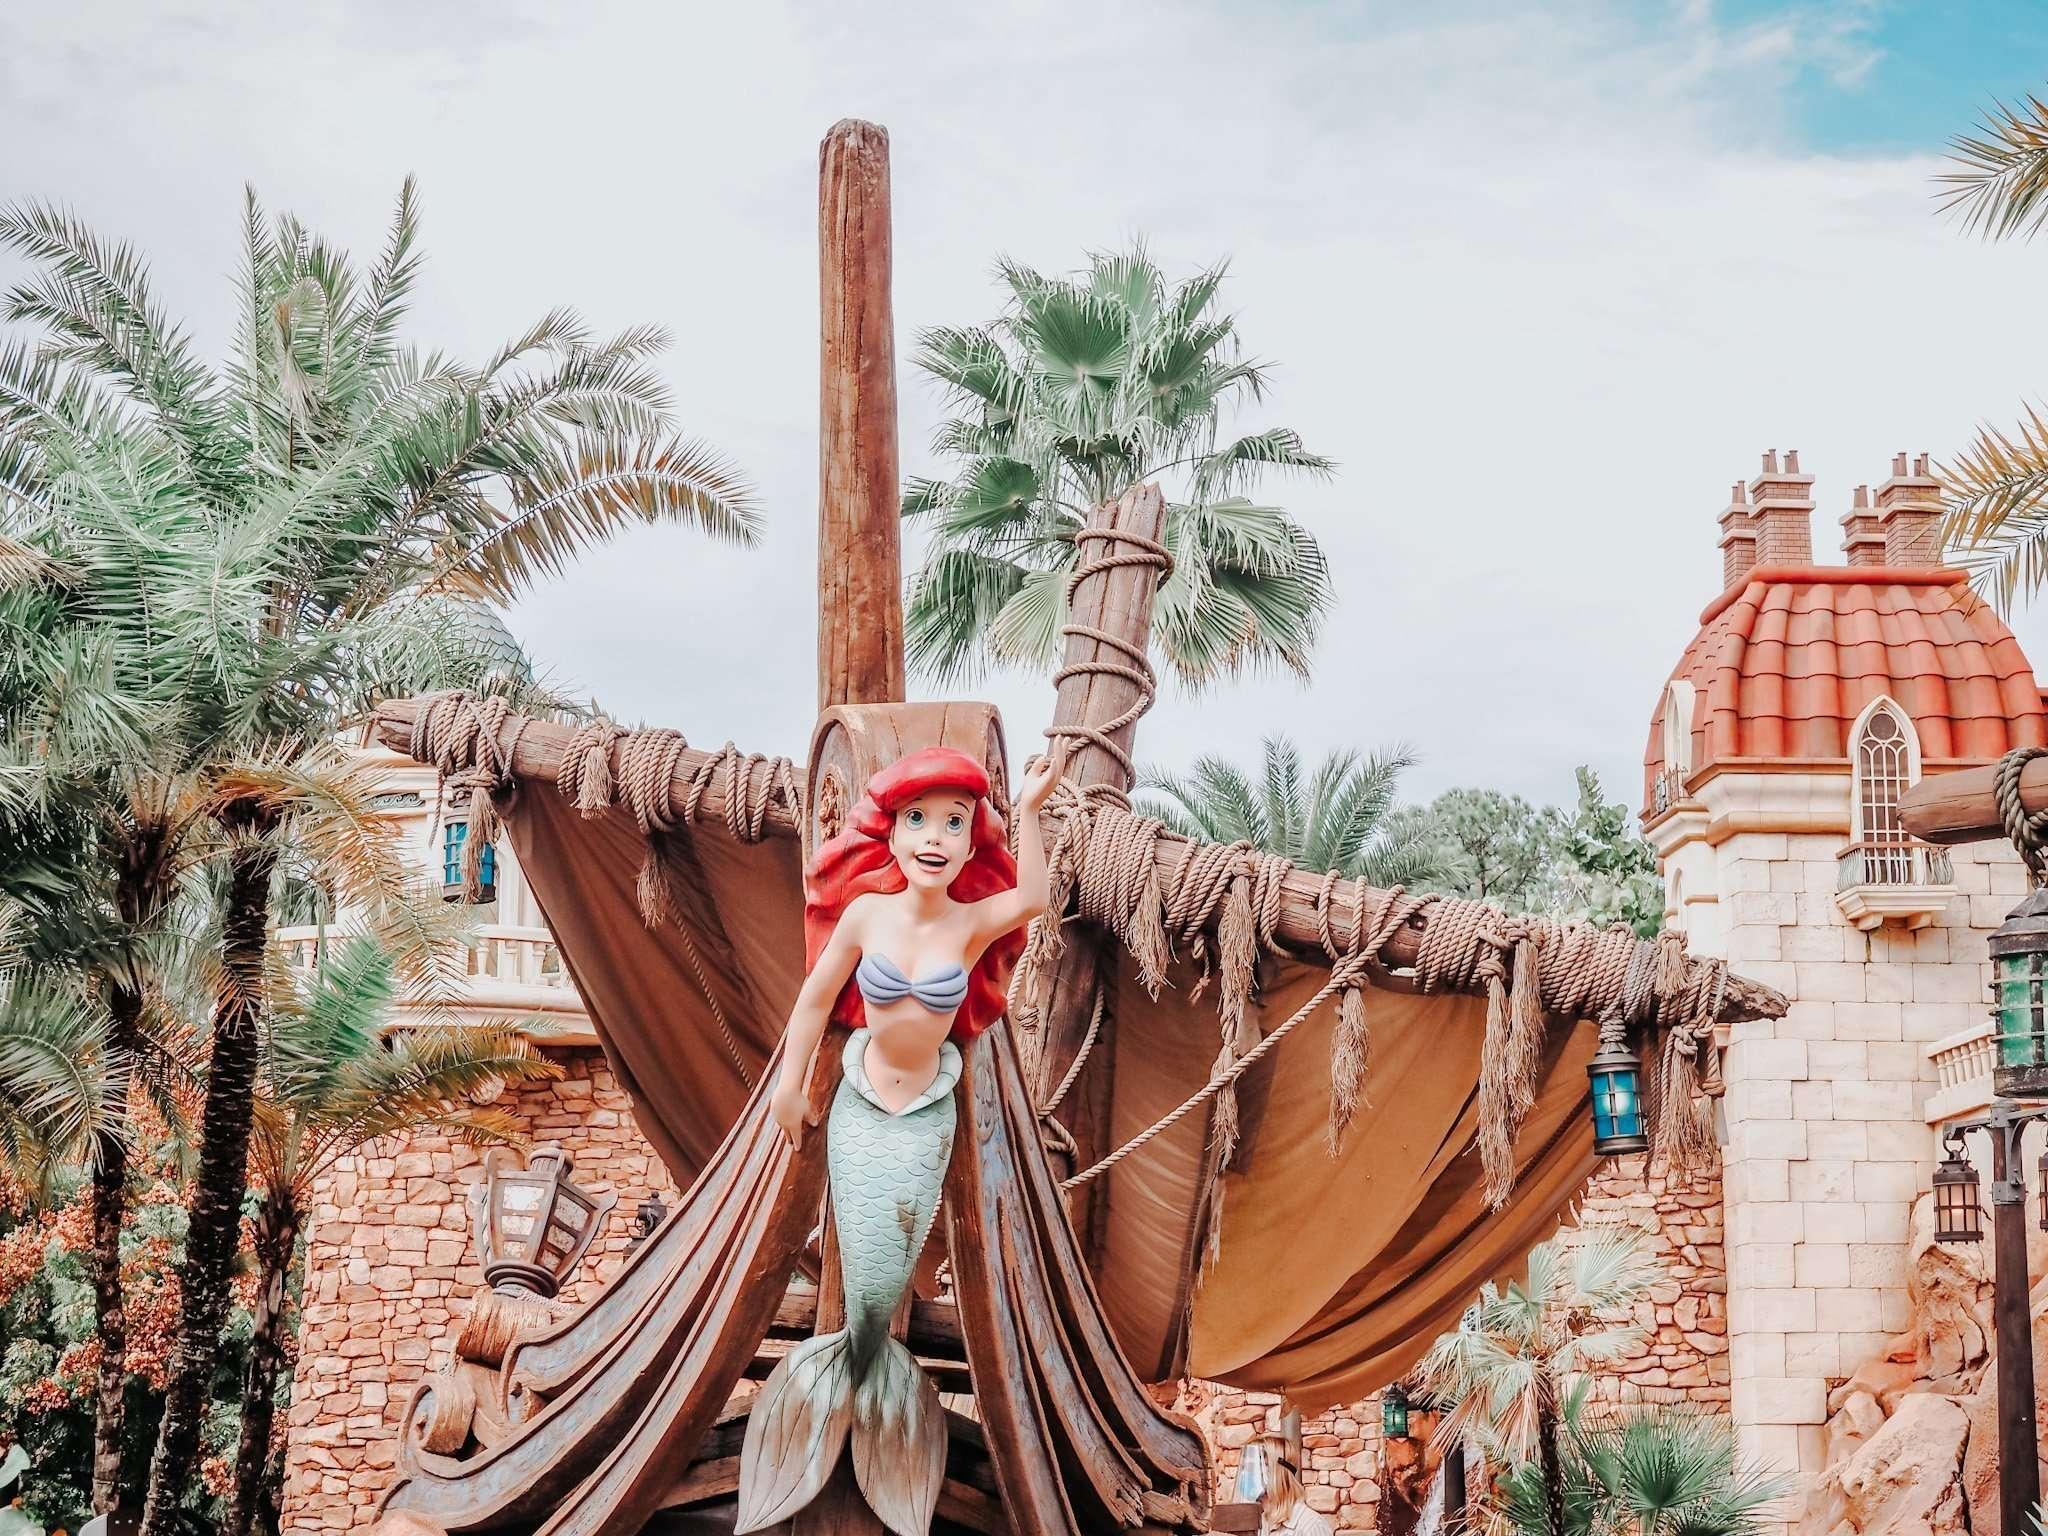 Walt Disney World Calendar of Events 2022